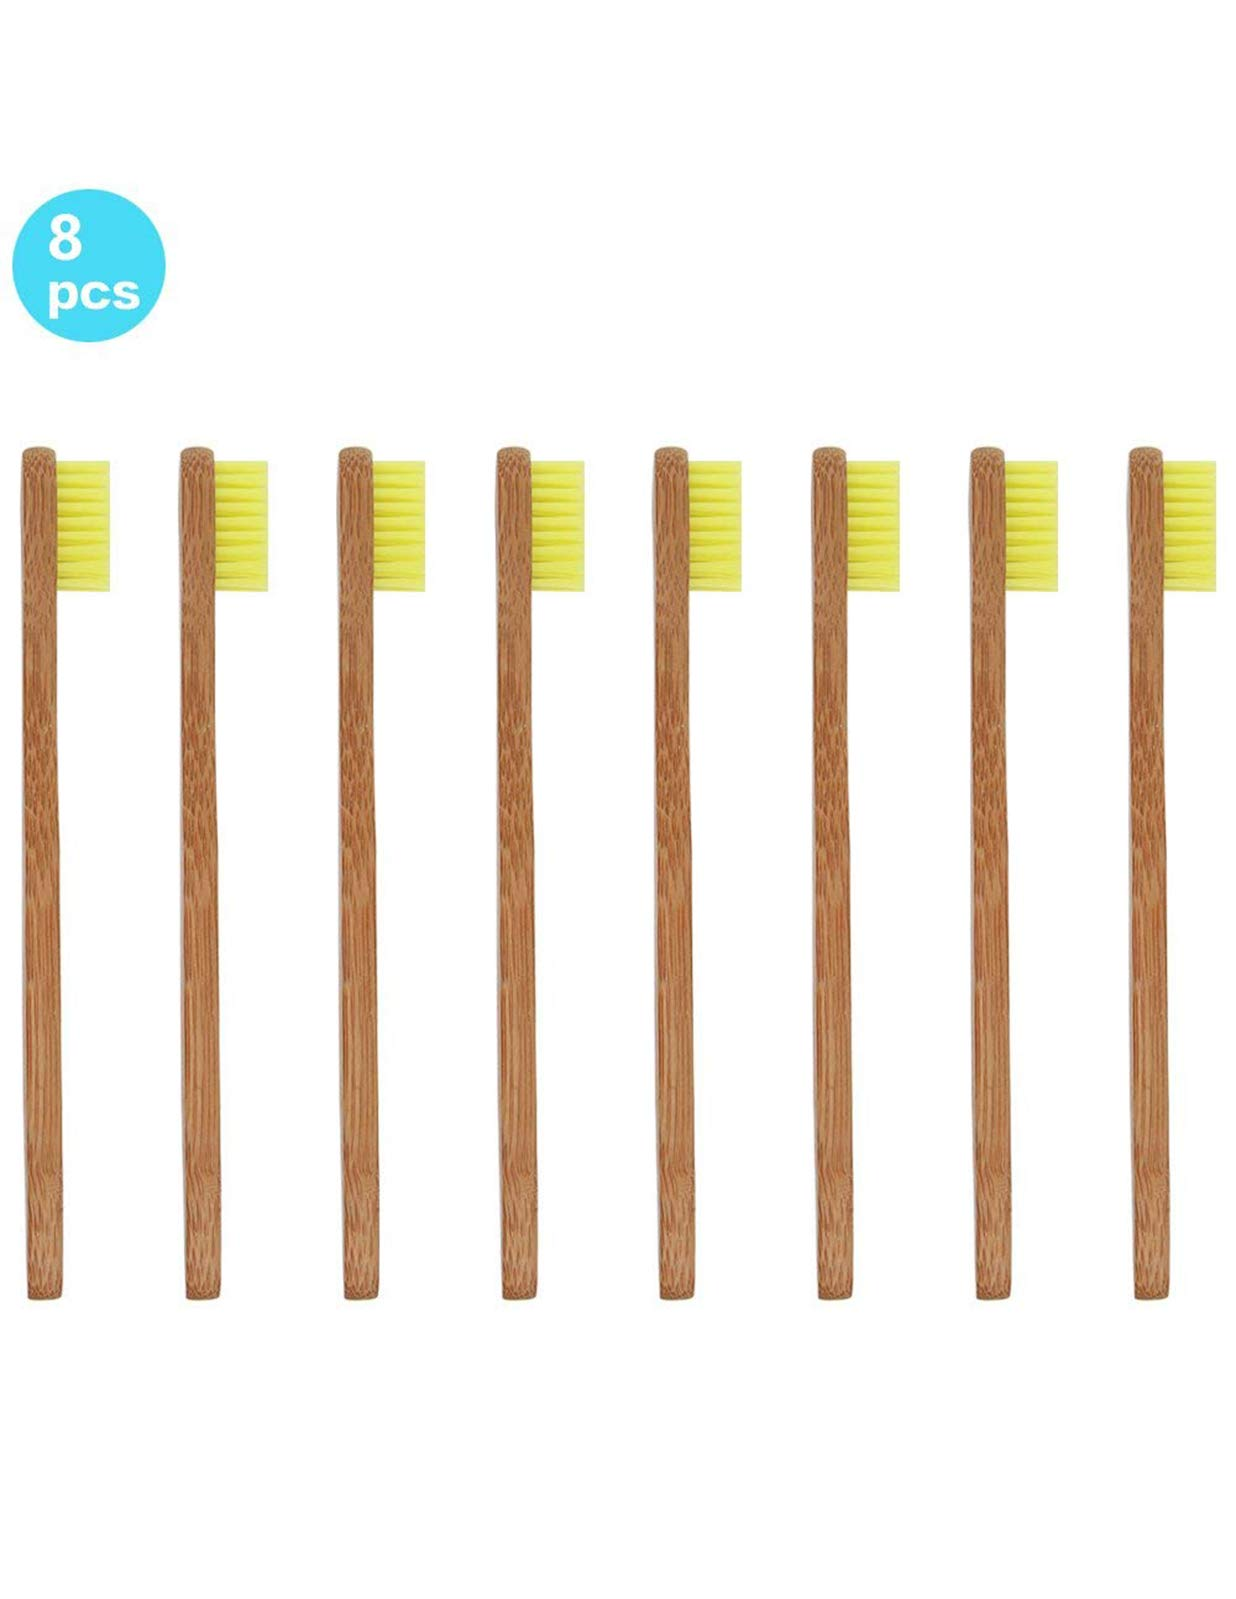 Bamboo Toothbrush for Kids Eco-Friendly biodegradable Bamboo Handles and BPA-Free Nylon Bristles For Natural Dental SoniFox 8Pcs Yellow Color